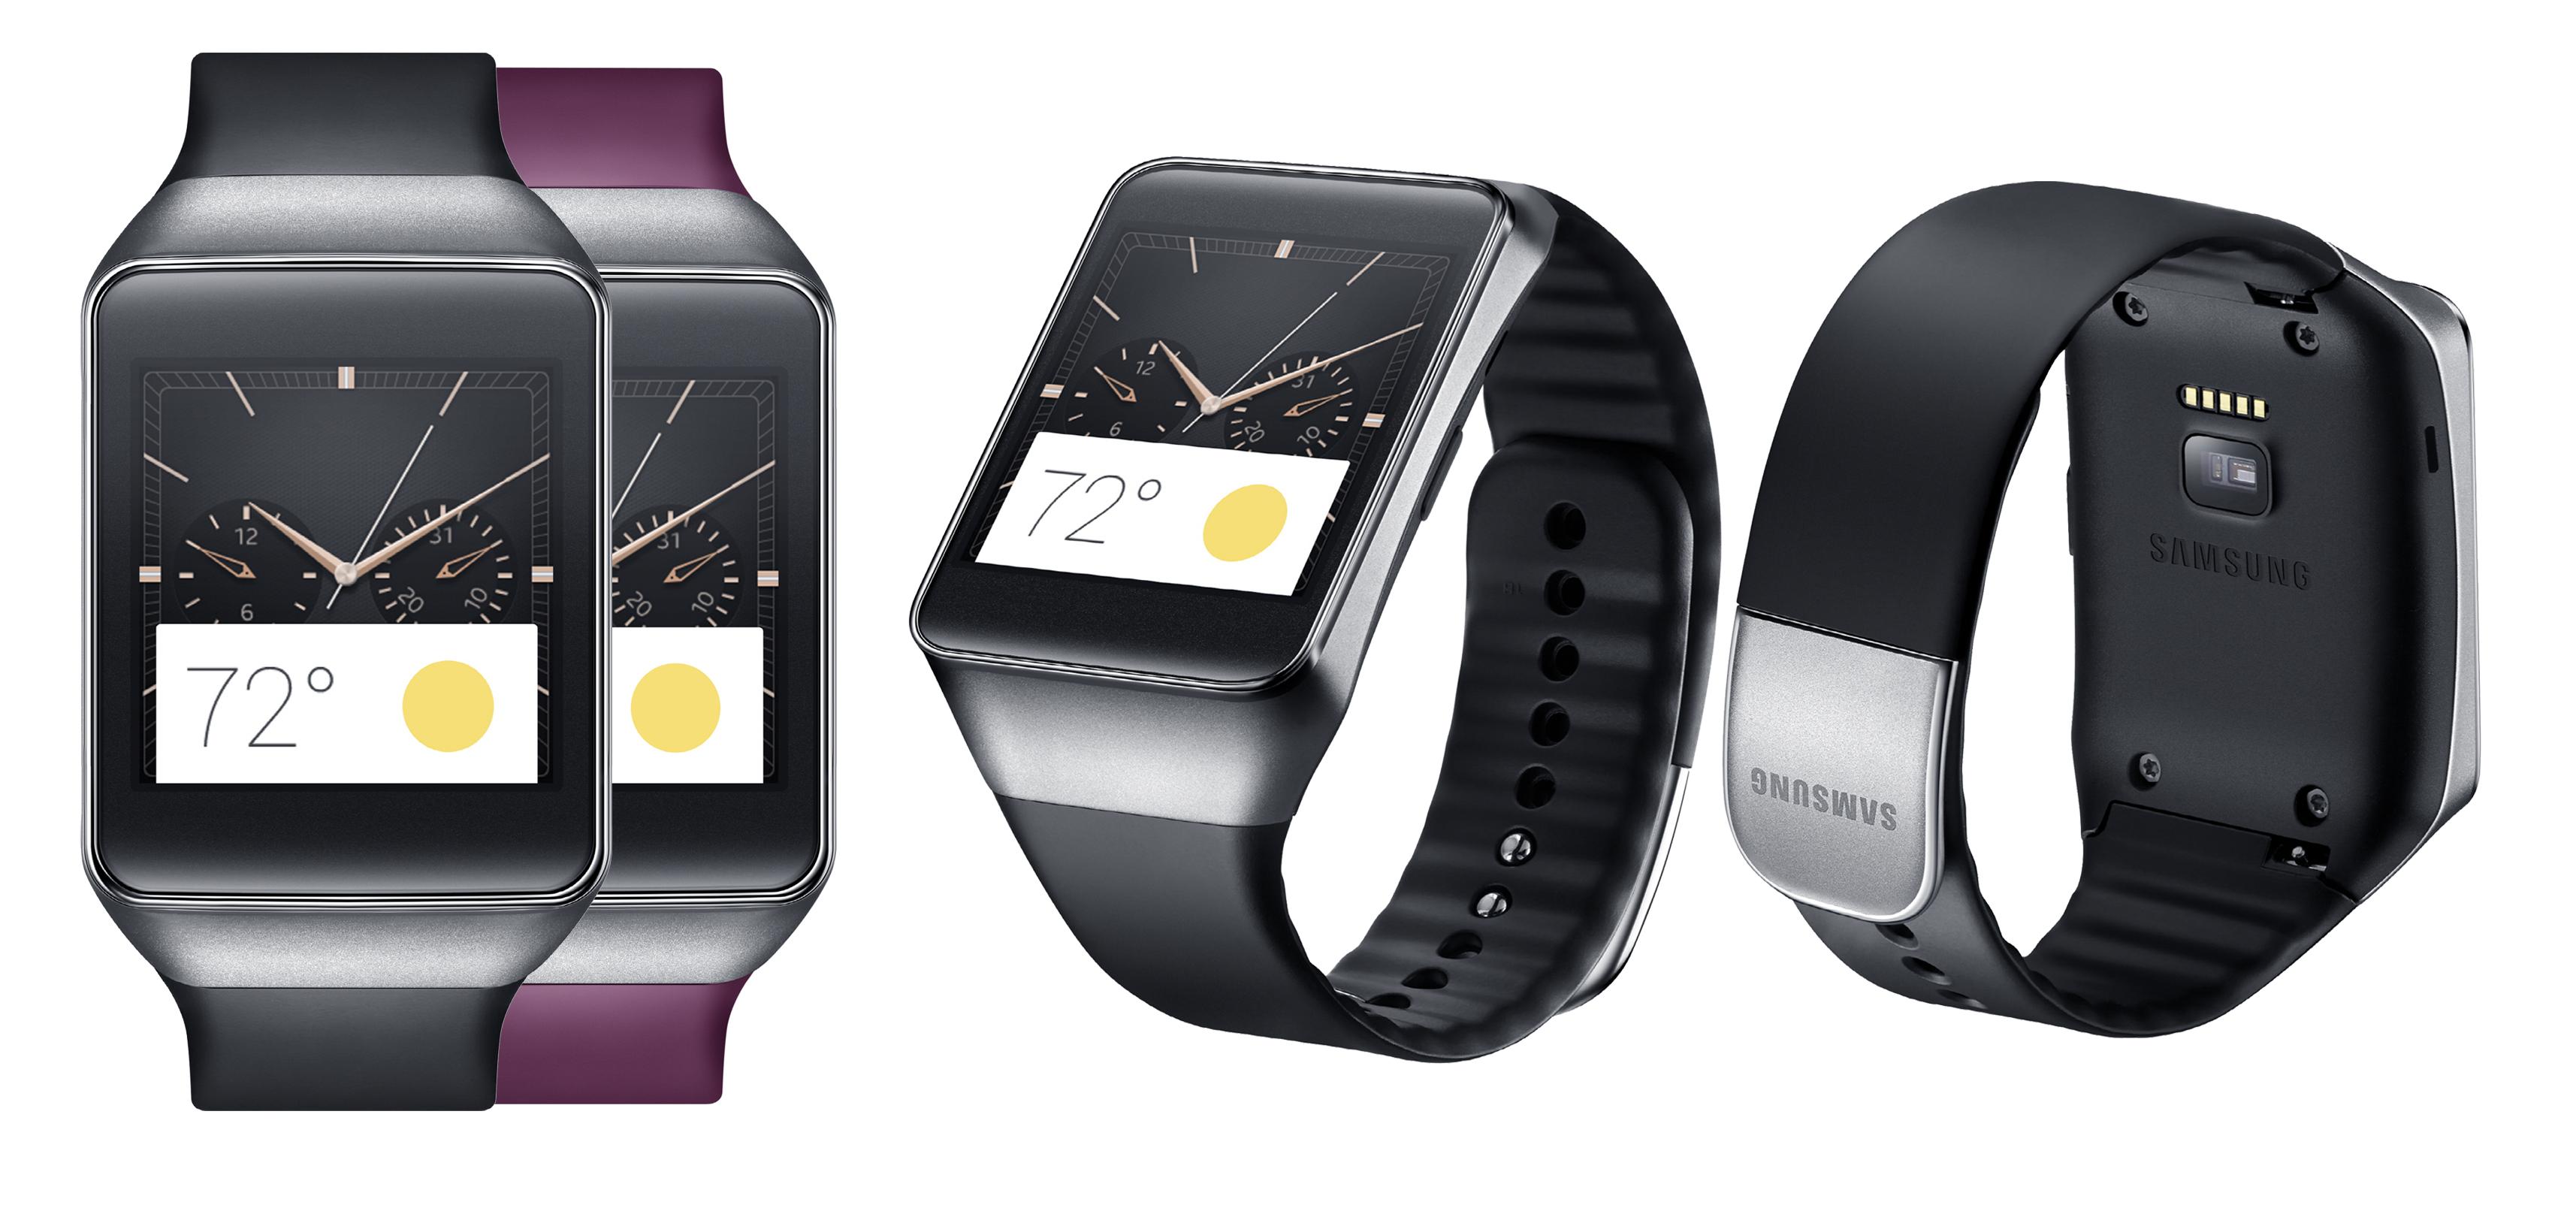 LG G Watch versus Samsung Gear Live versus Motorola Moto 360 2